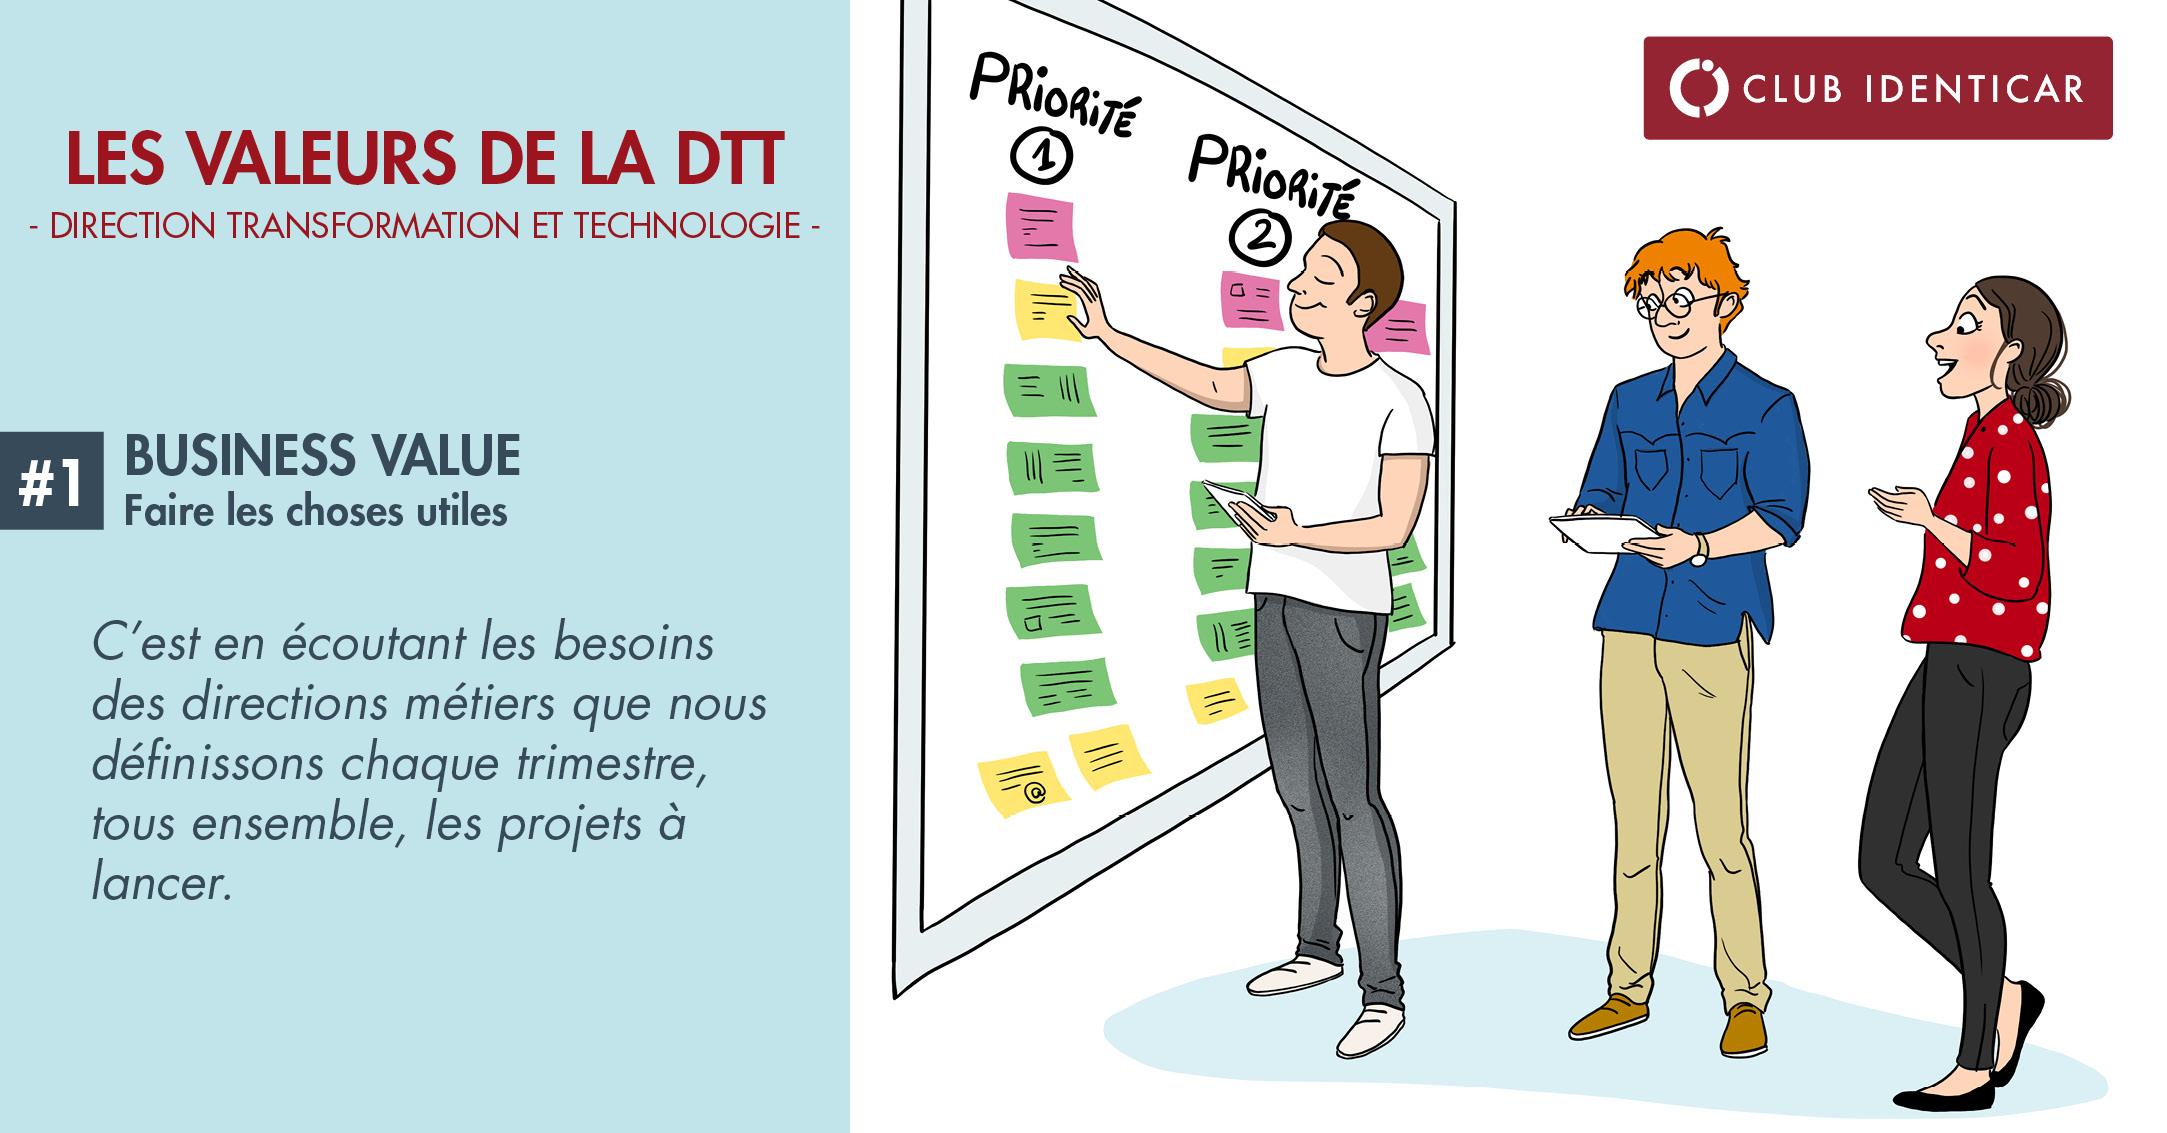 Les valeurs de la DTT